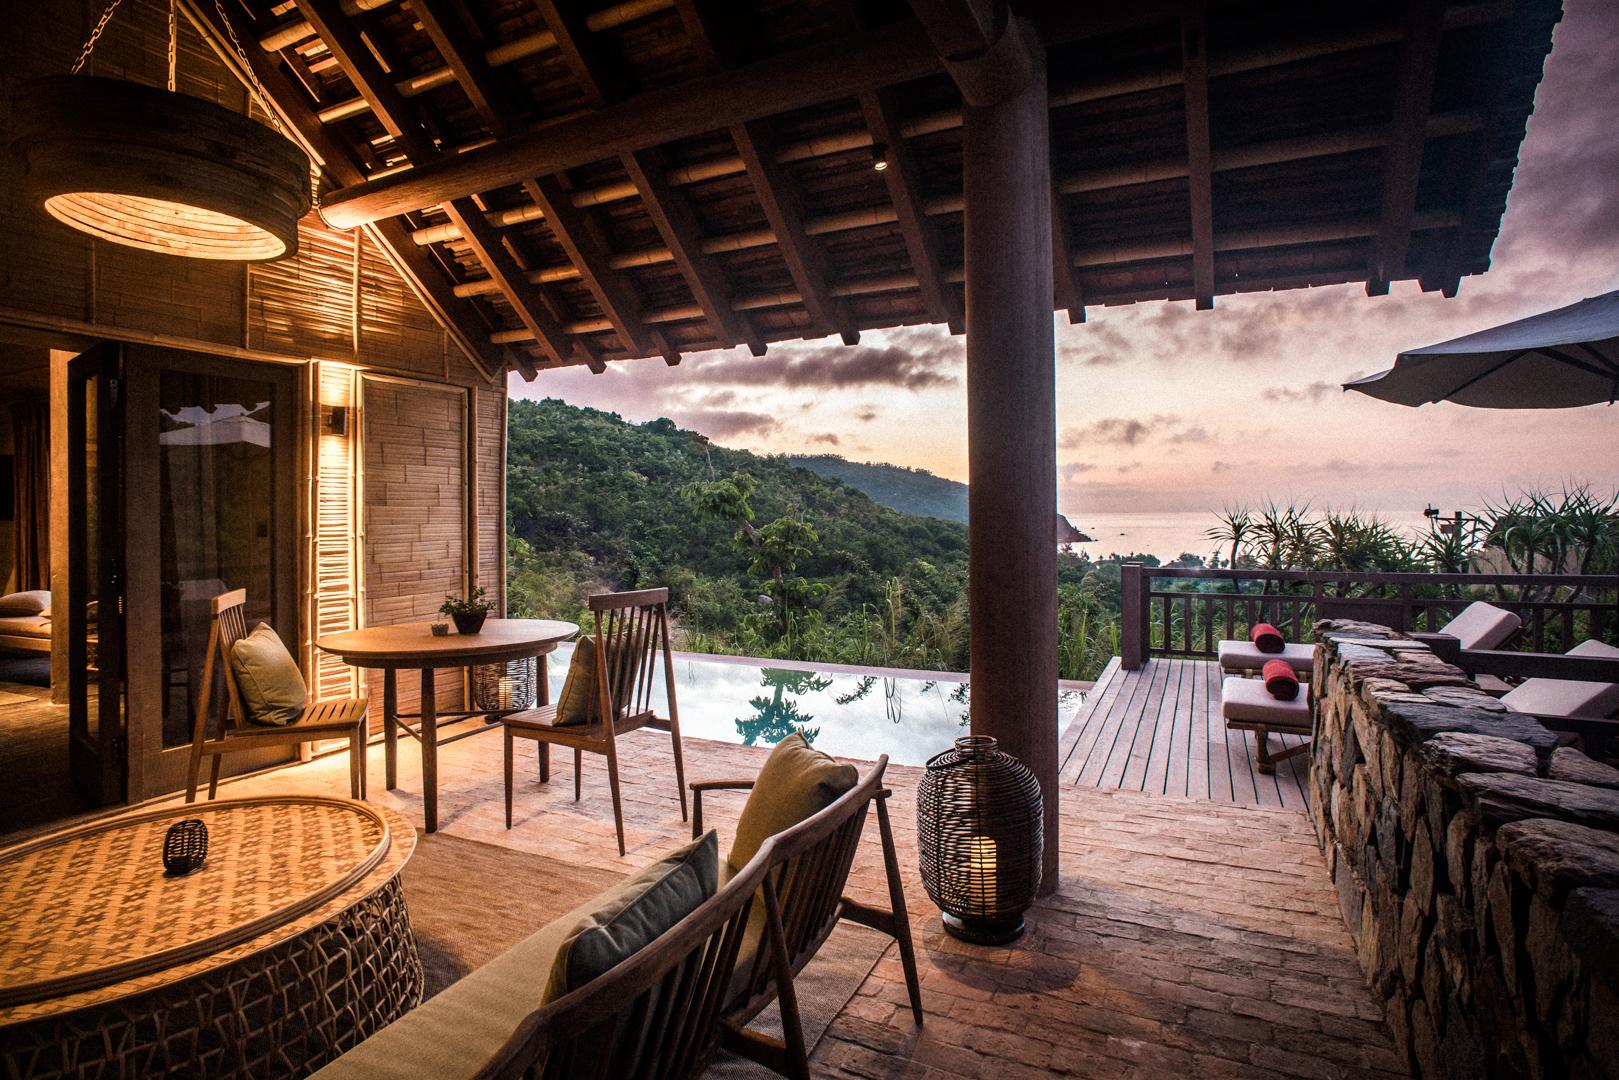 Zannier-Hotels-Bãi-San-Hô-Hill-Pool-Villa-Exterior-3-©-Frederik-Wissink-for-Zannier-Hotels-1